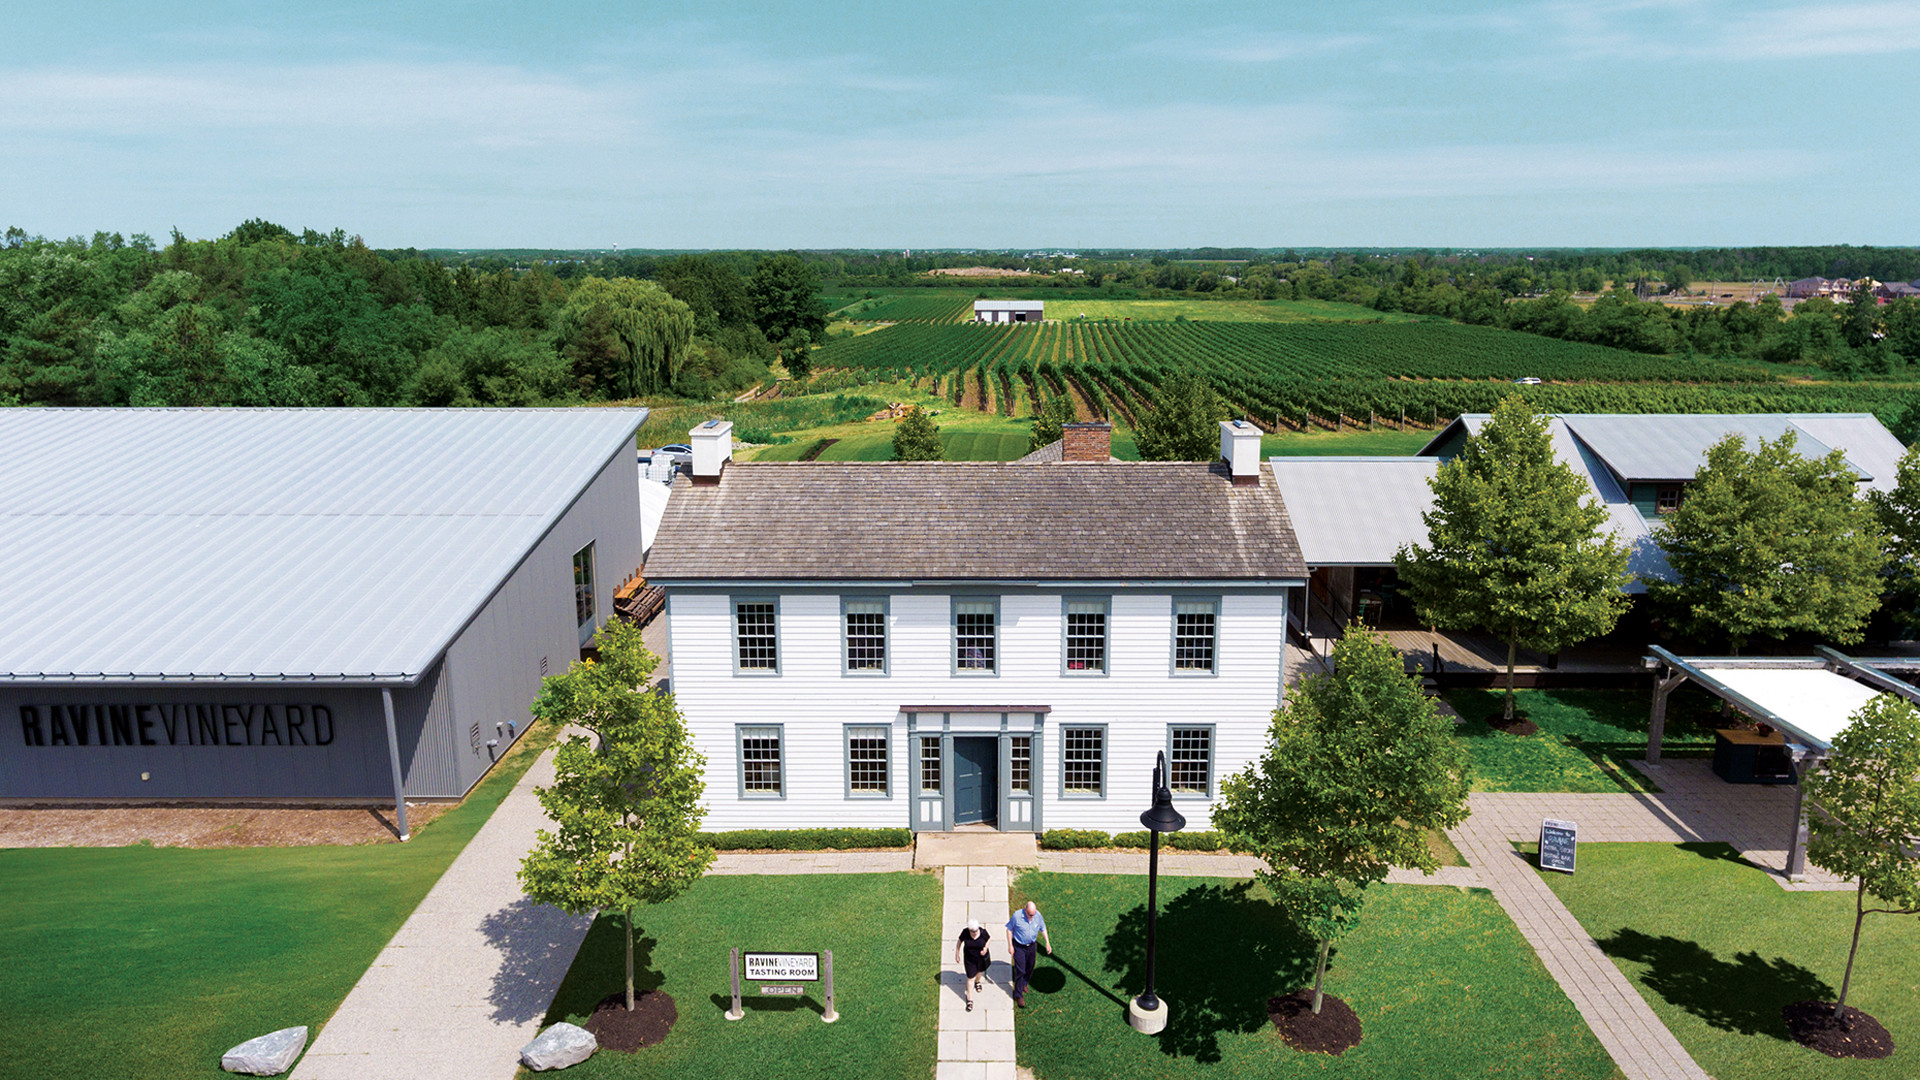 The best wineries in Niagara-on-the-Lake | Ravine Vineyard Estate Winery